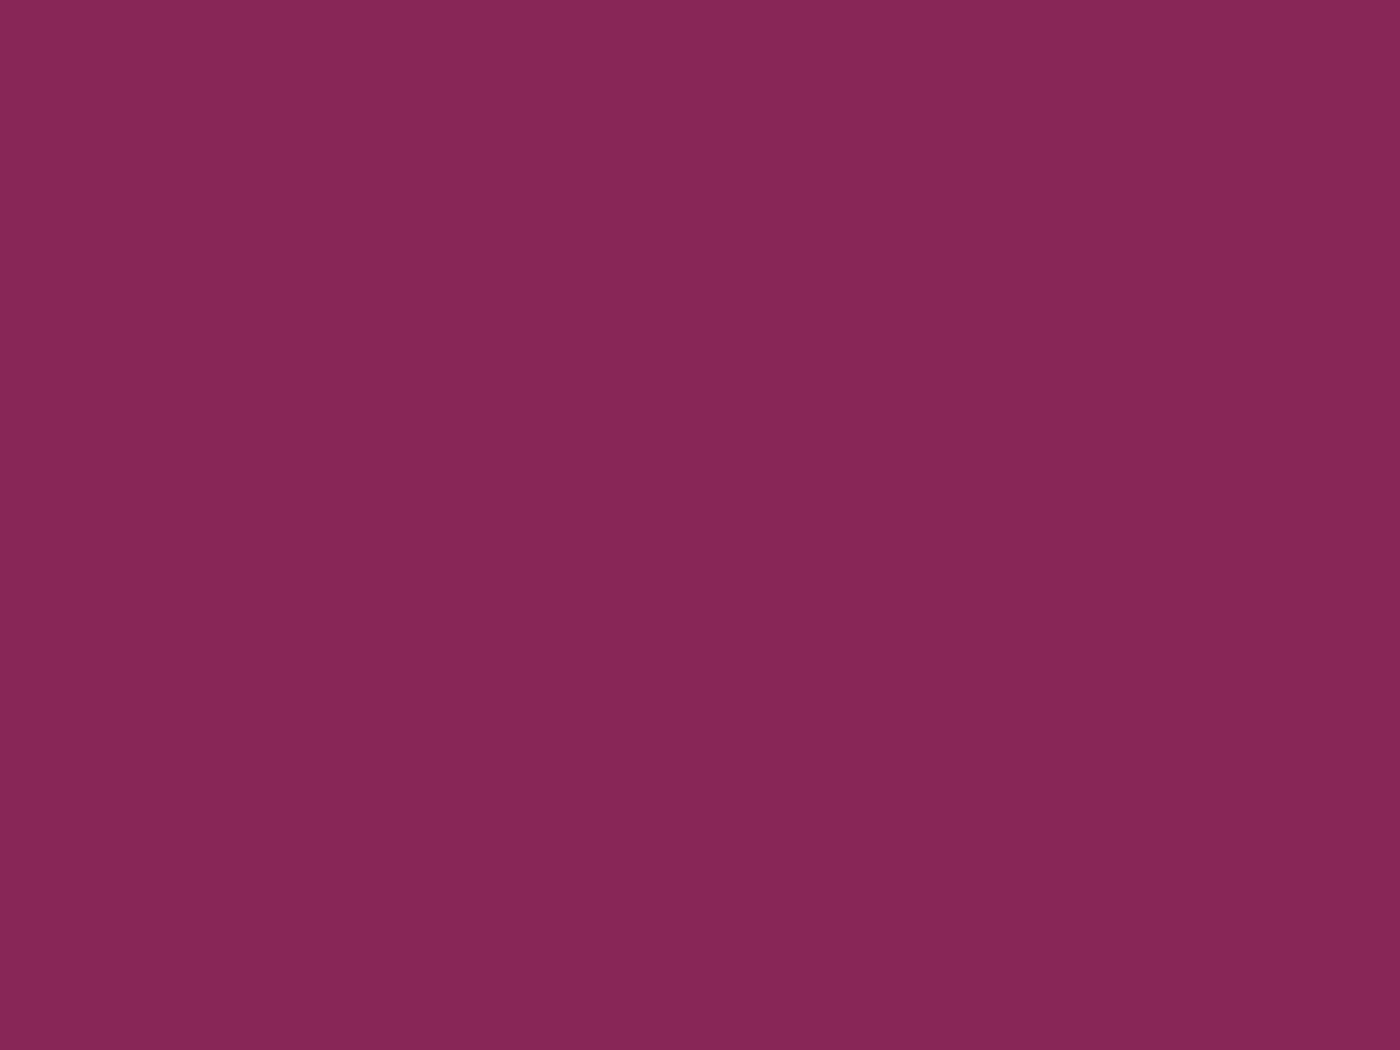 Raspberry Purple Color 1400x1050 dark raspberry solid 1400x1050